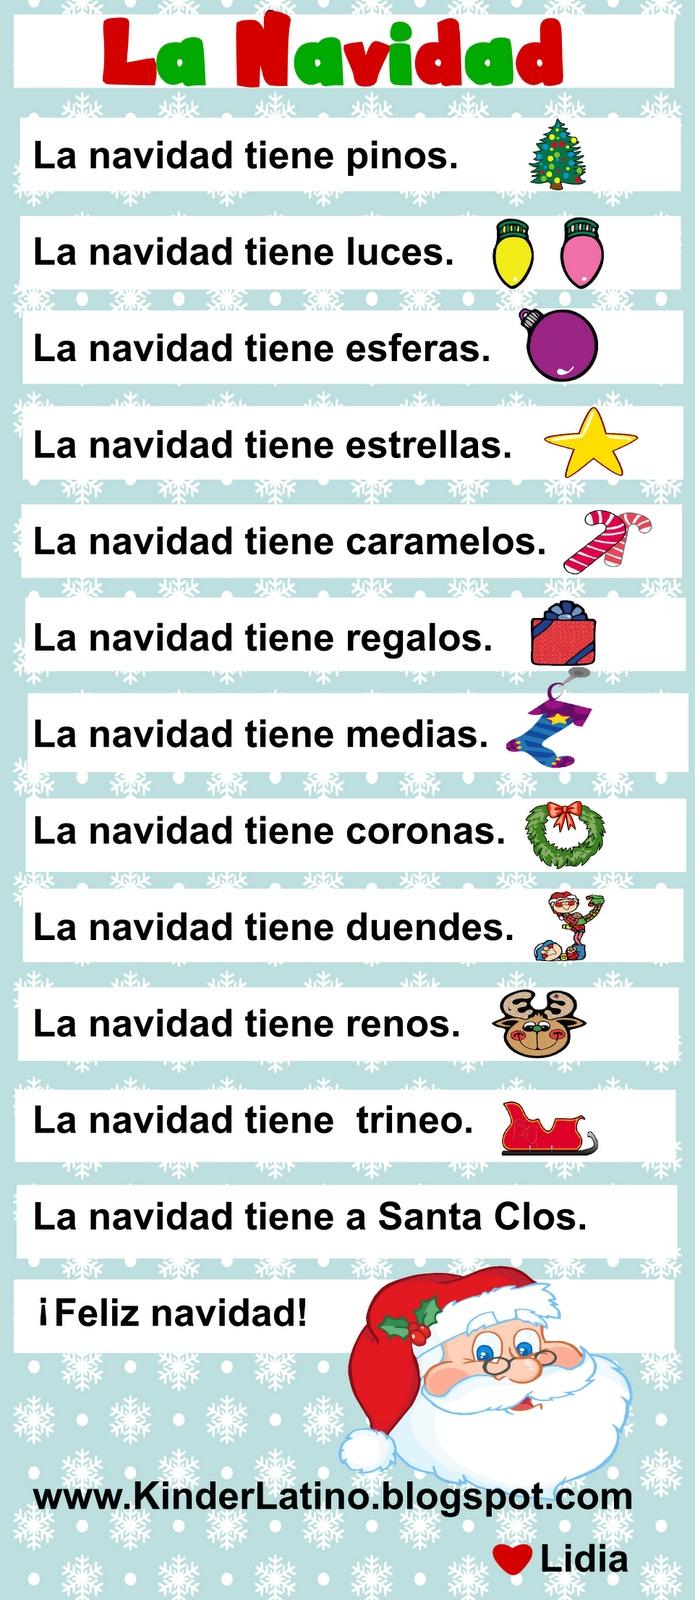 #Spanish phrases Christmas #Spanish Christmas vocabulary #Christmas Spanish vocabulary